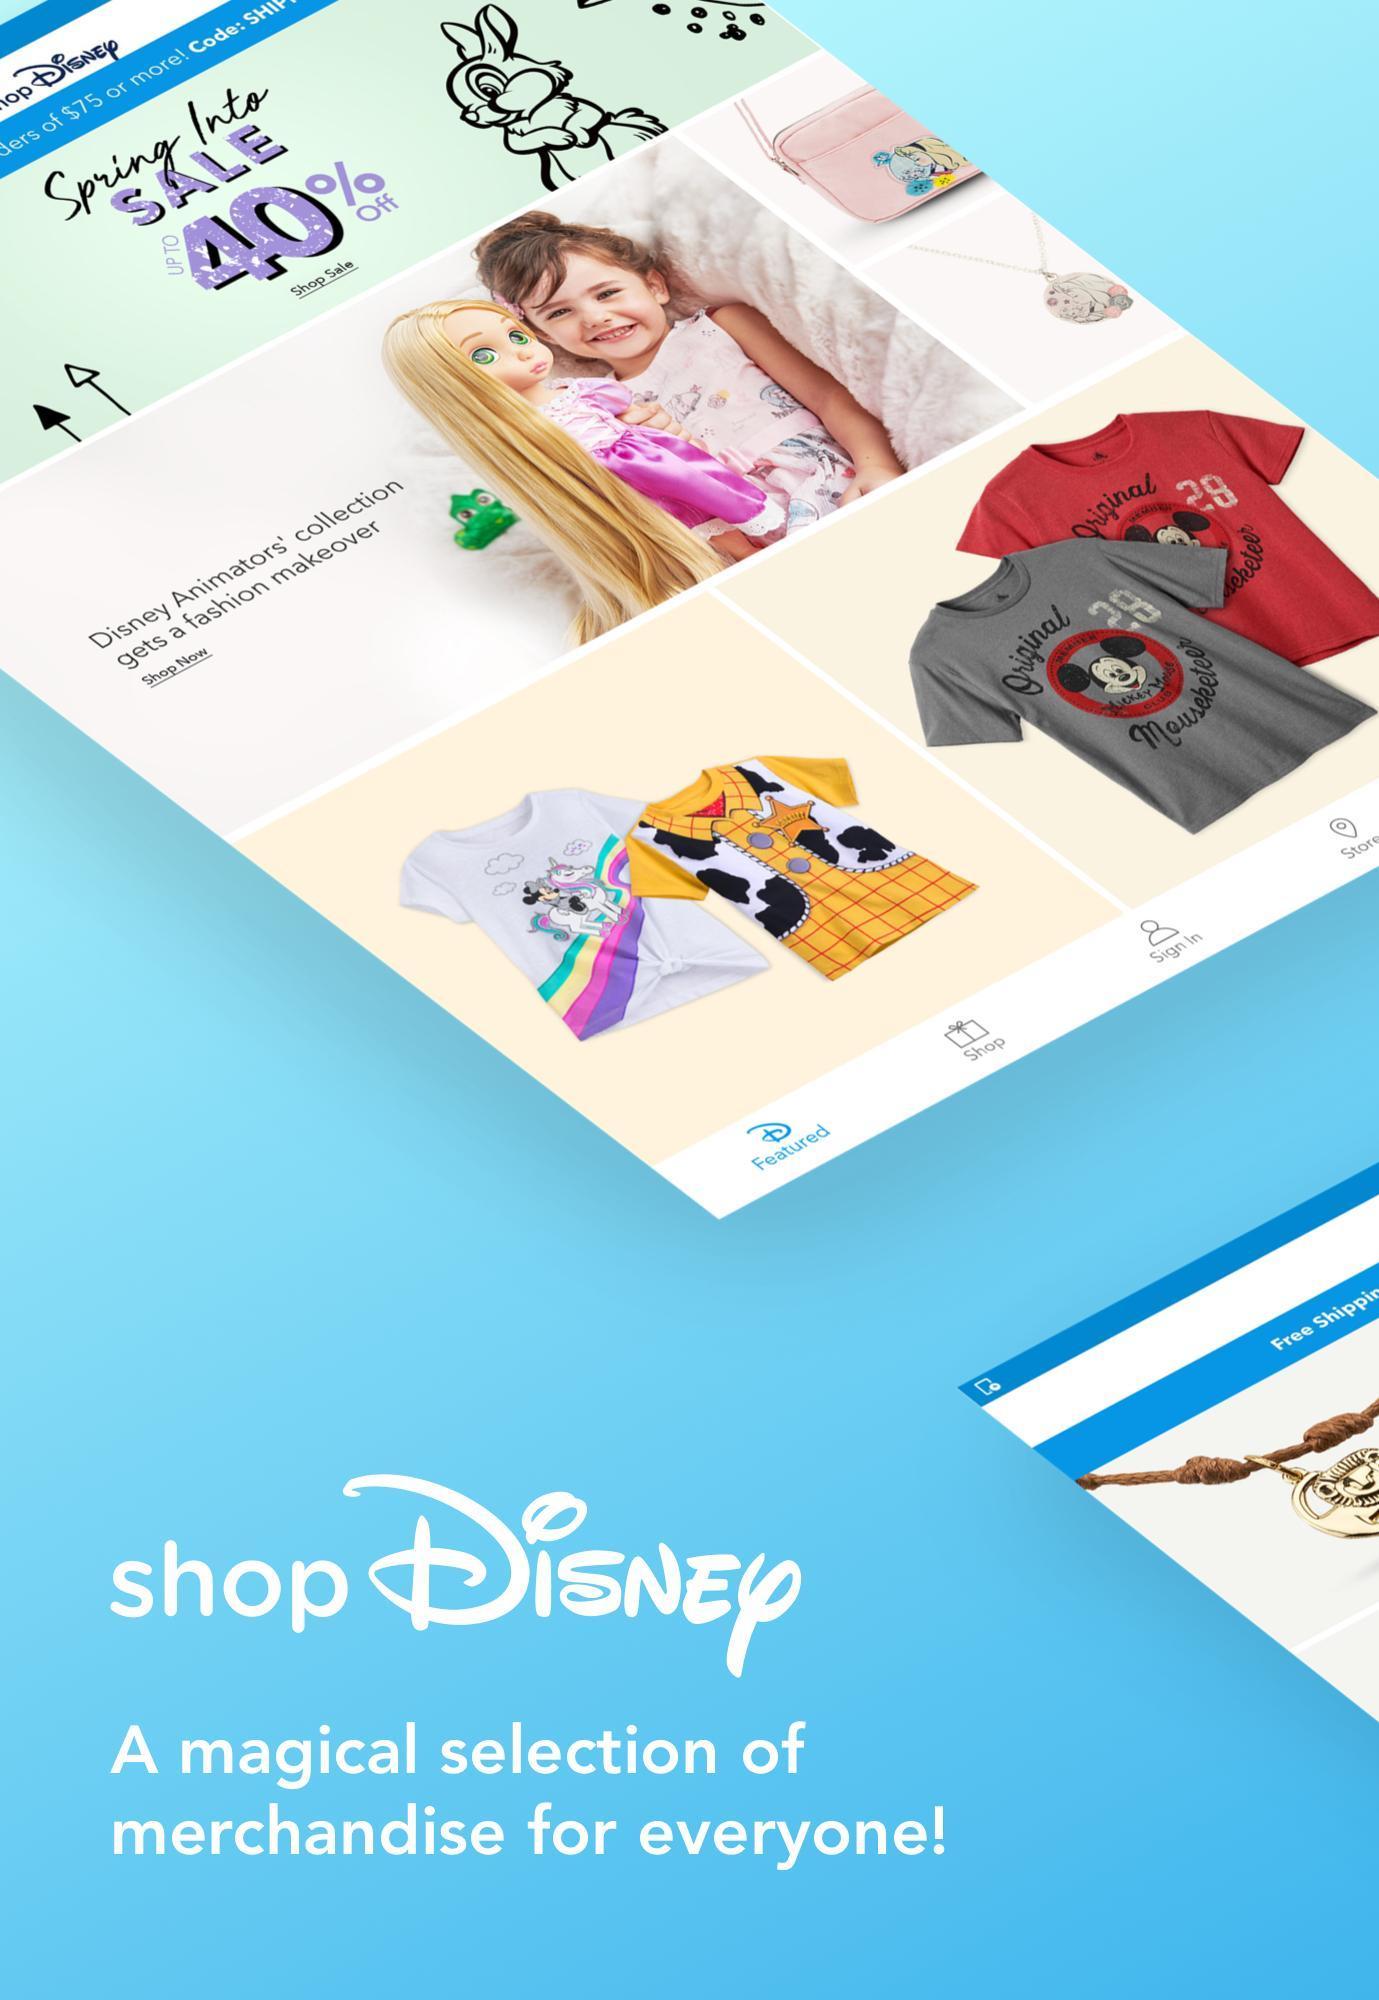 Shop Disney 3.1.1 Screenshot 6